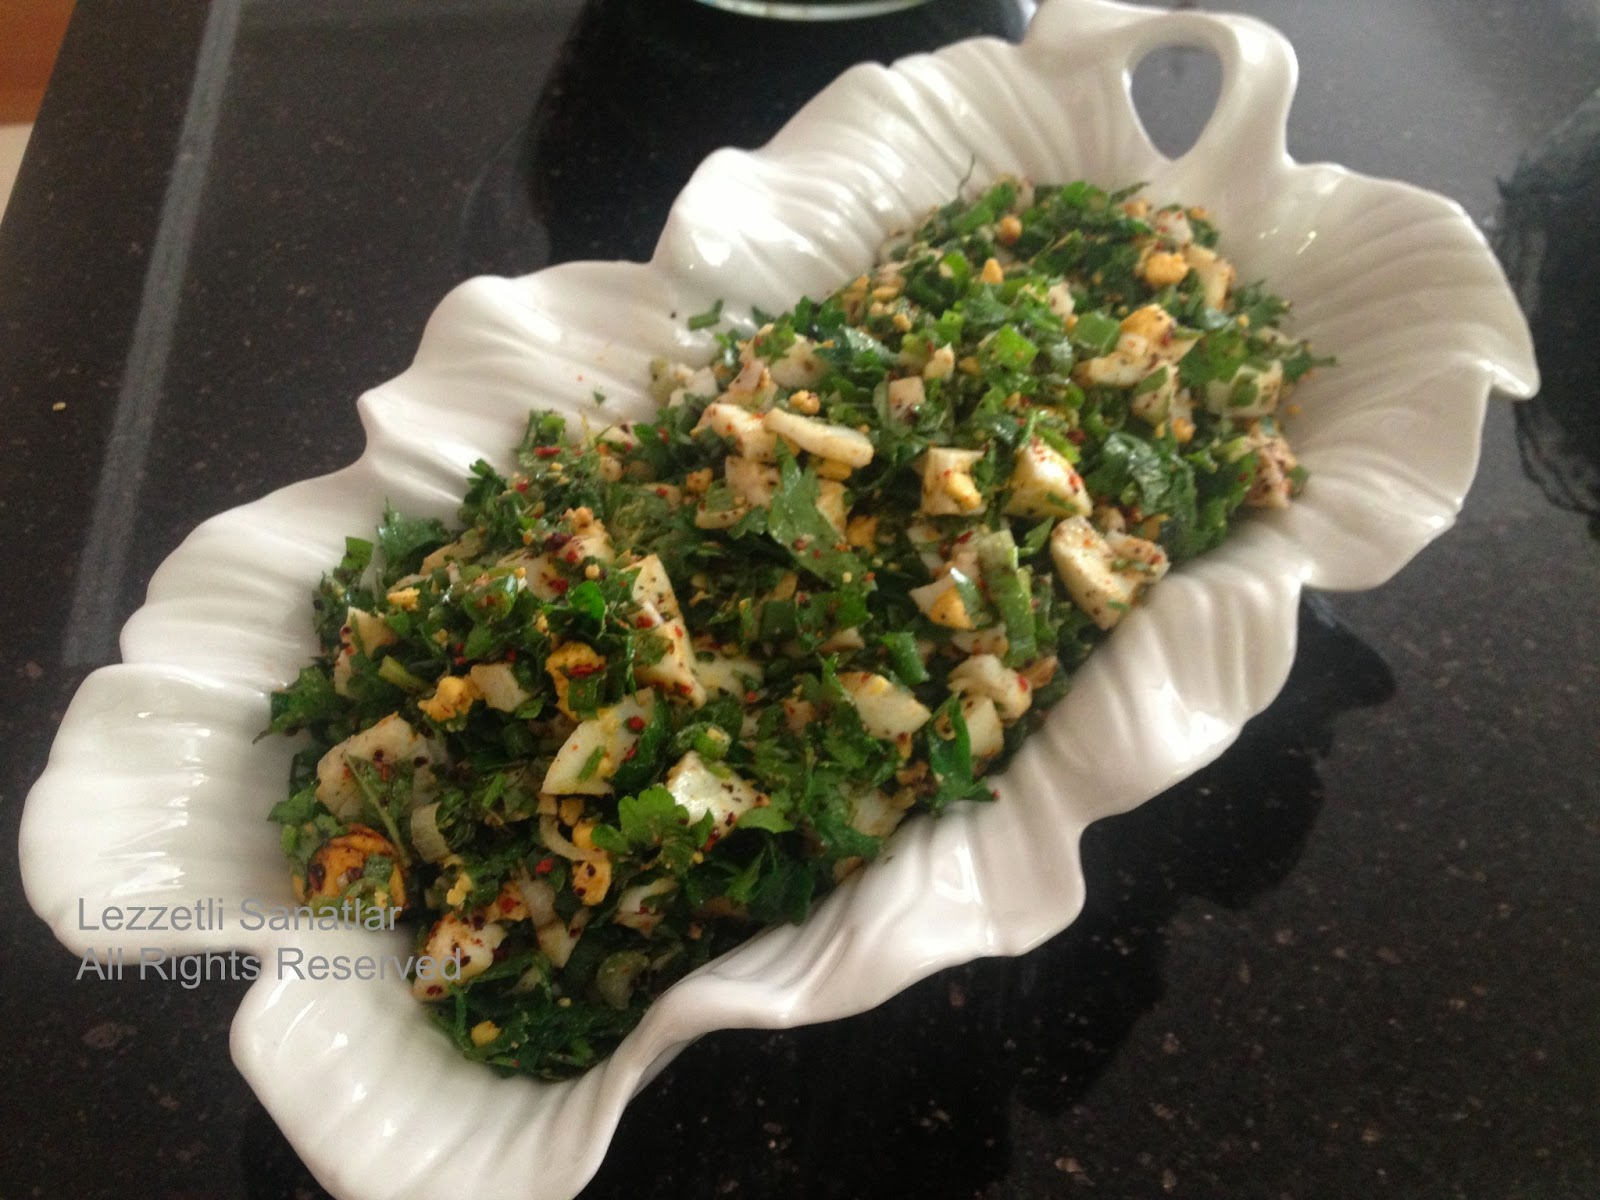 Somunlu yumurtalı salata tarifi